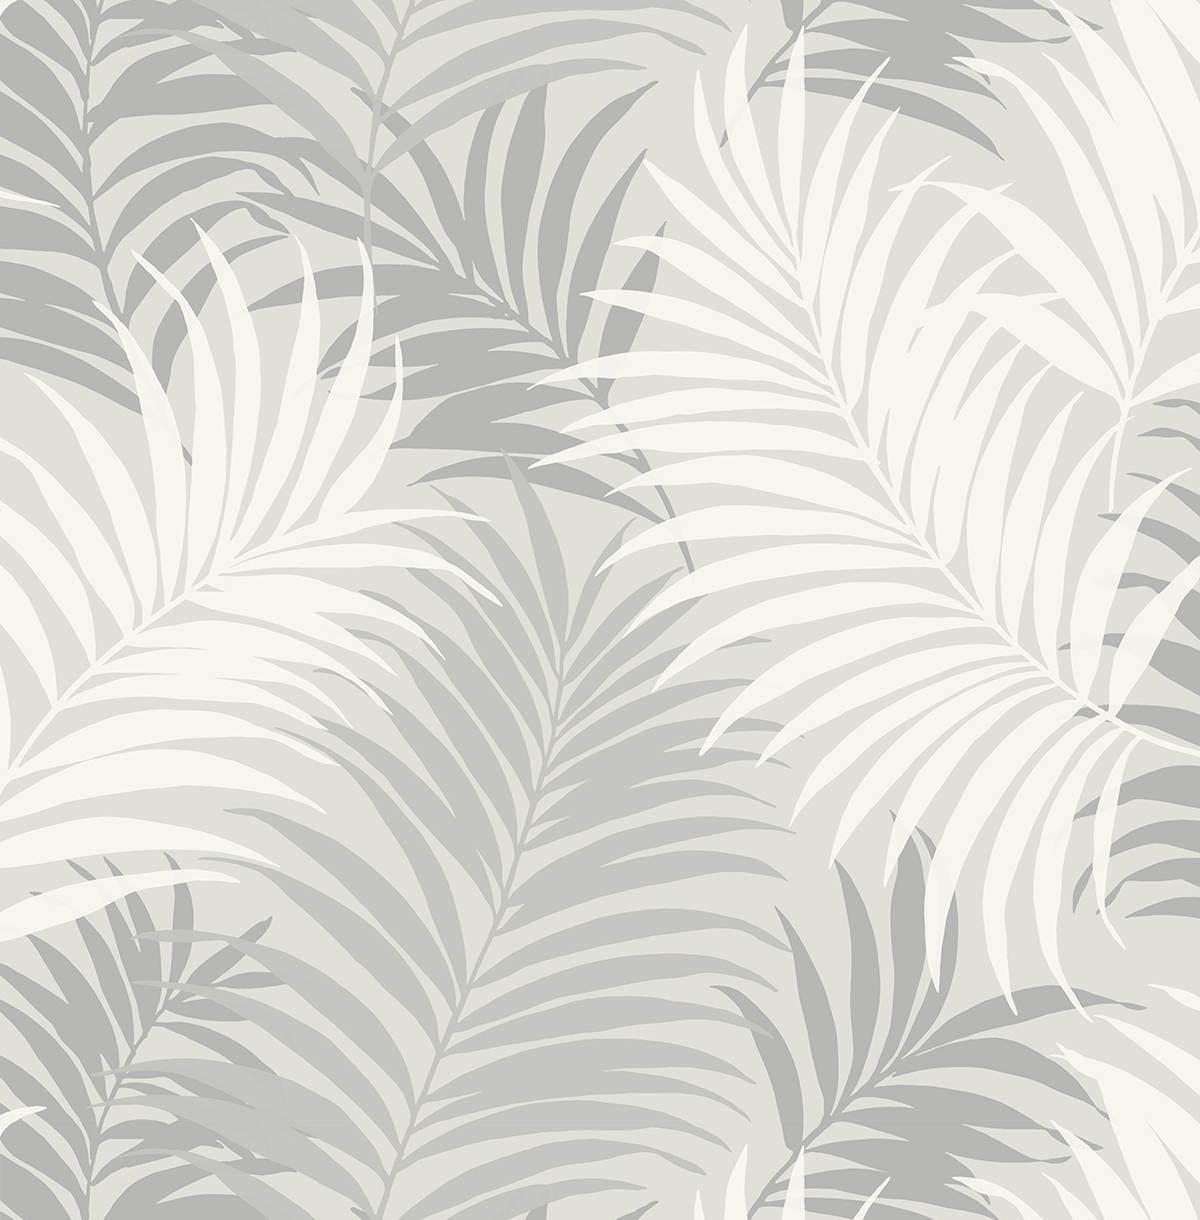 Американские обои Seabrook, коллекция Lux Retreat by Lillian August, артикул LN10108